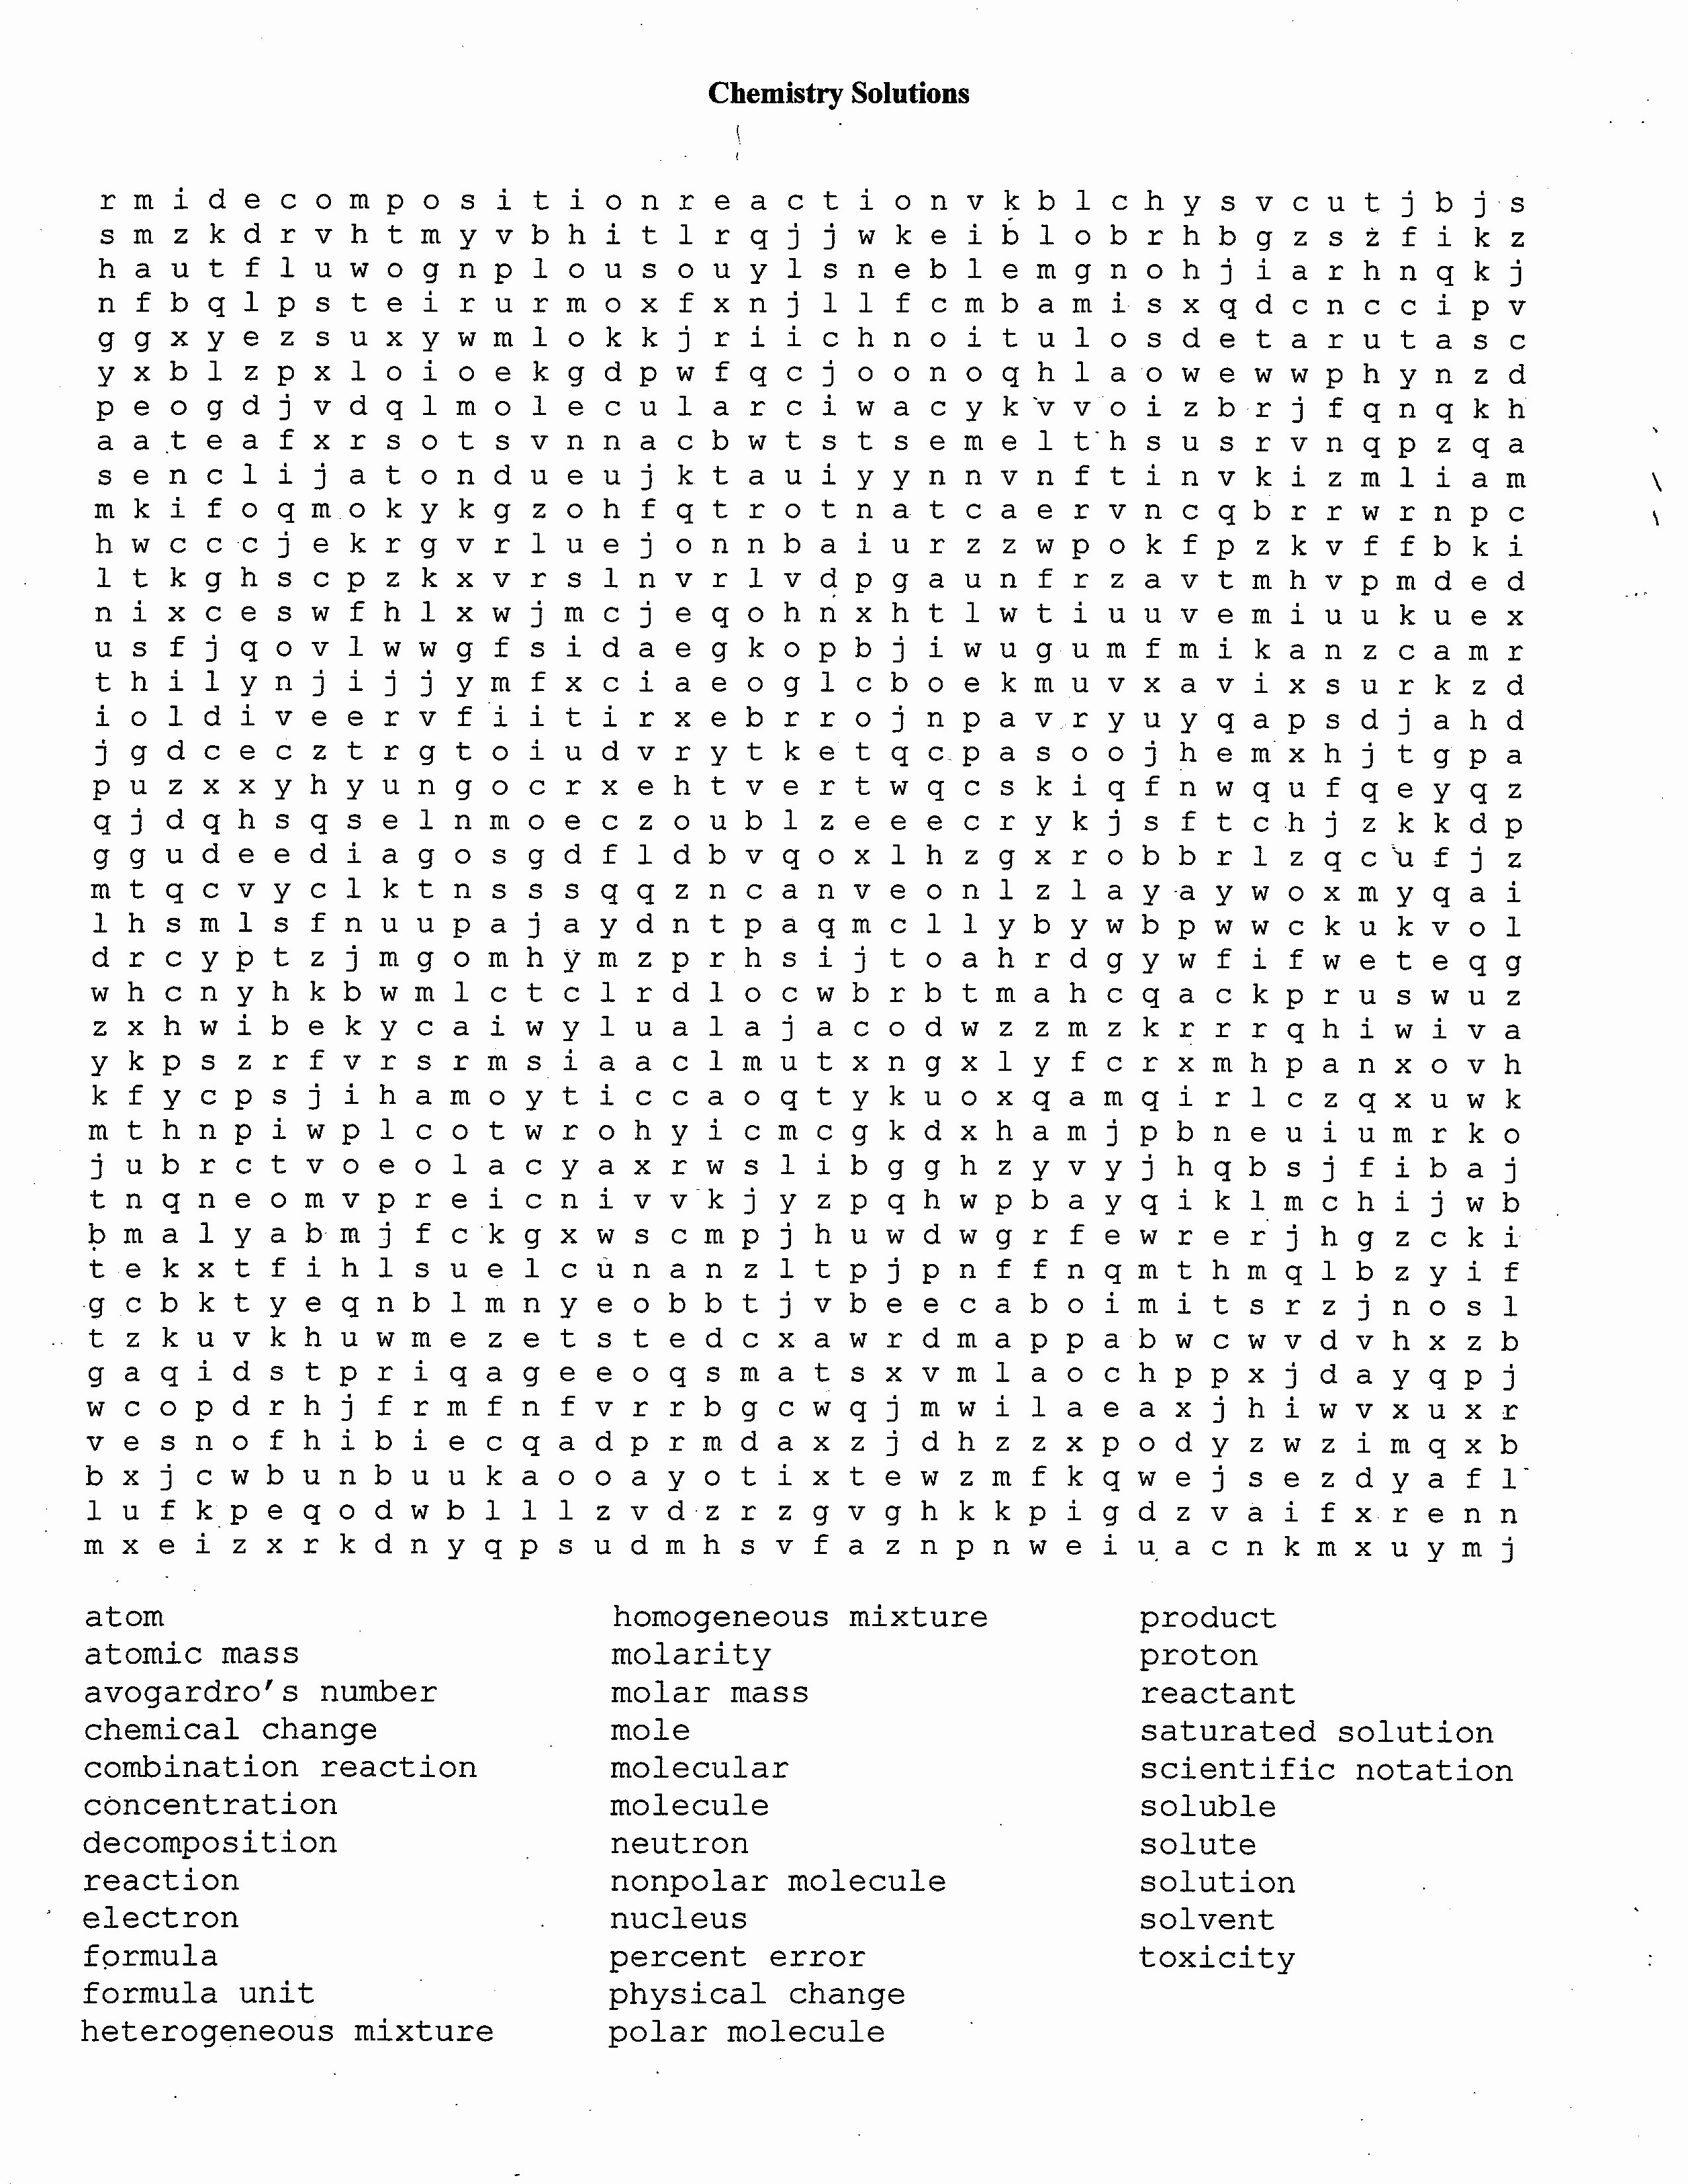 Metric Mania Worksheet Answers Inspirational Metric Mania Worksheet the Best Worksheets Image